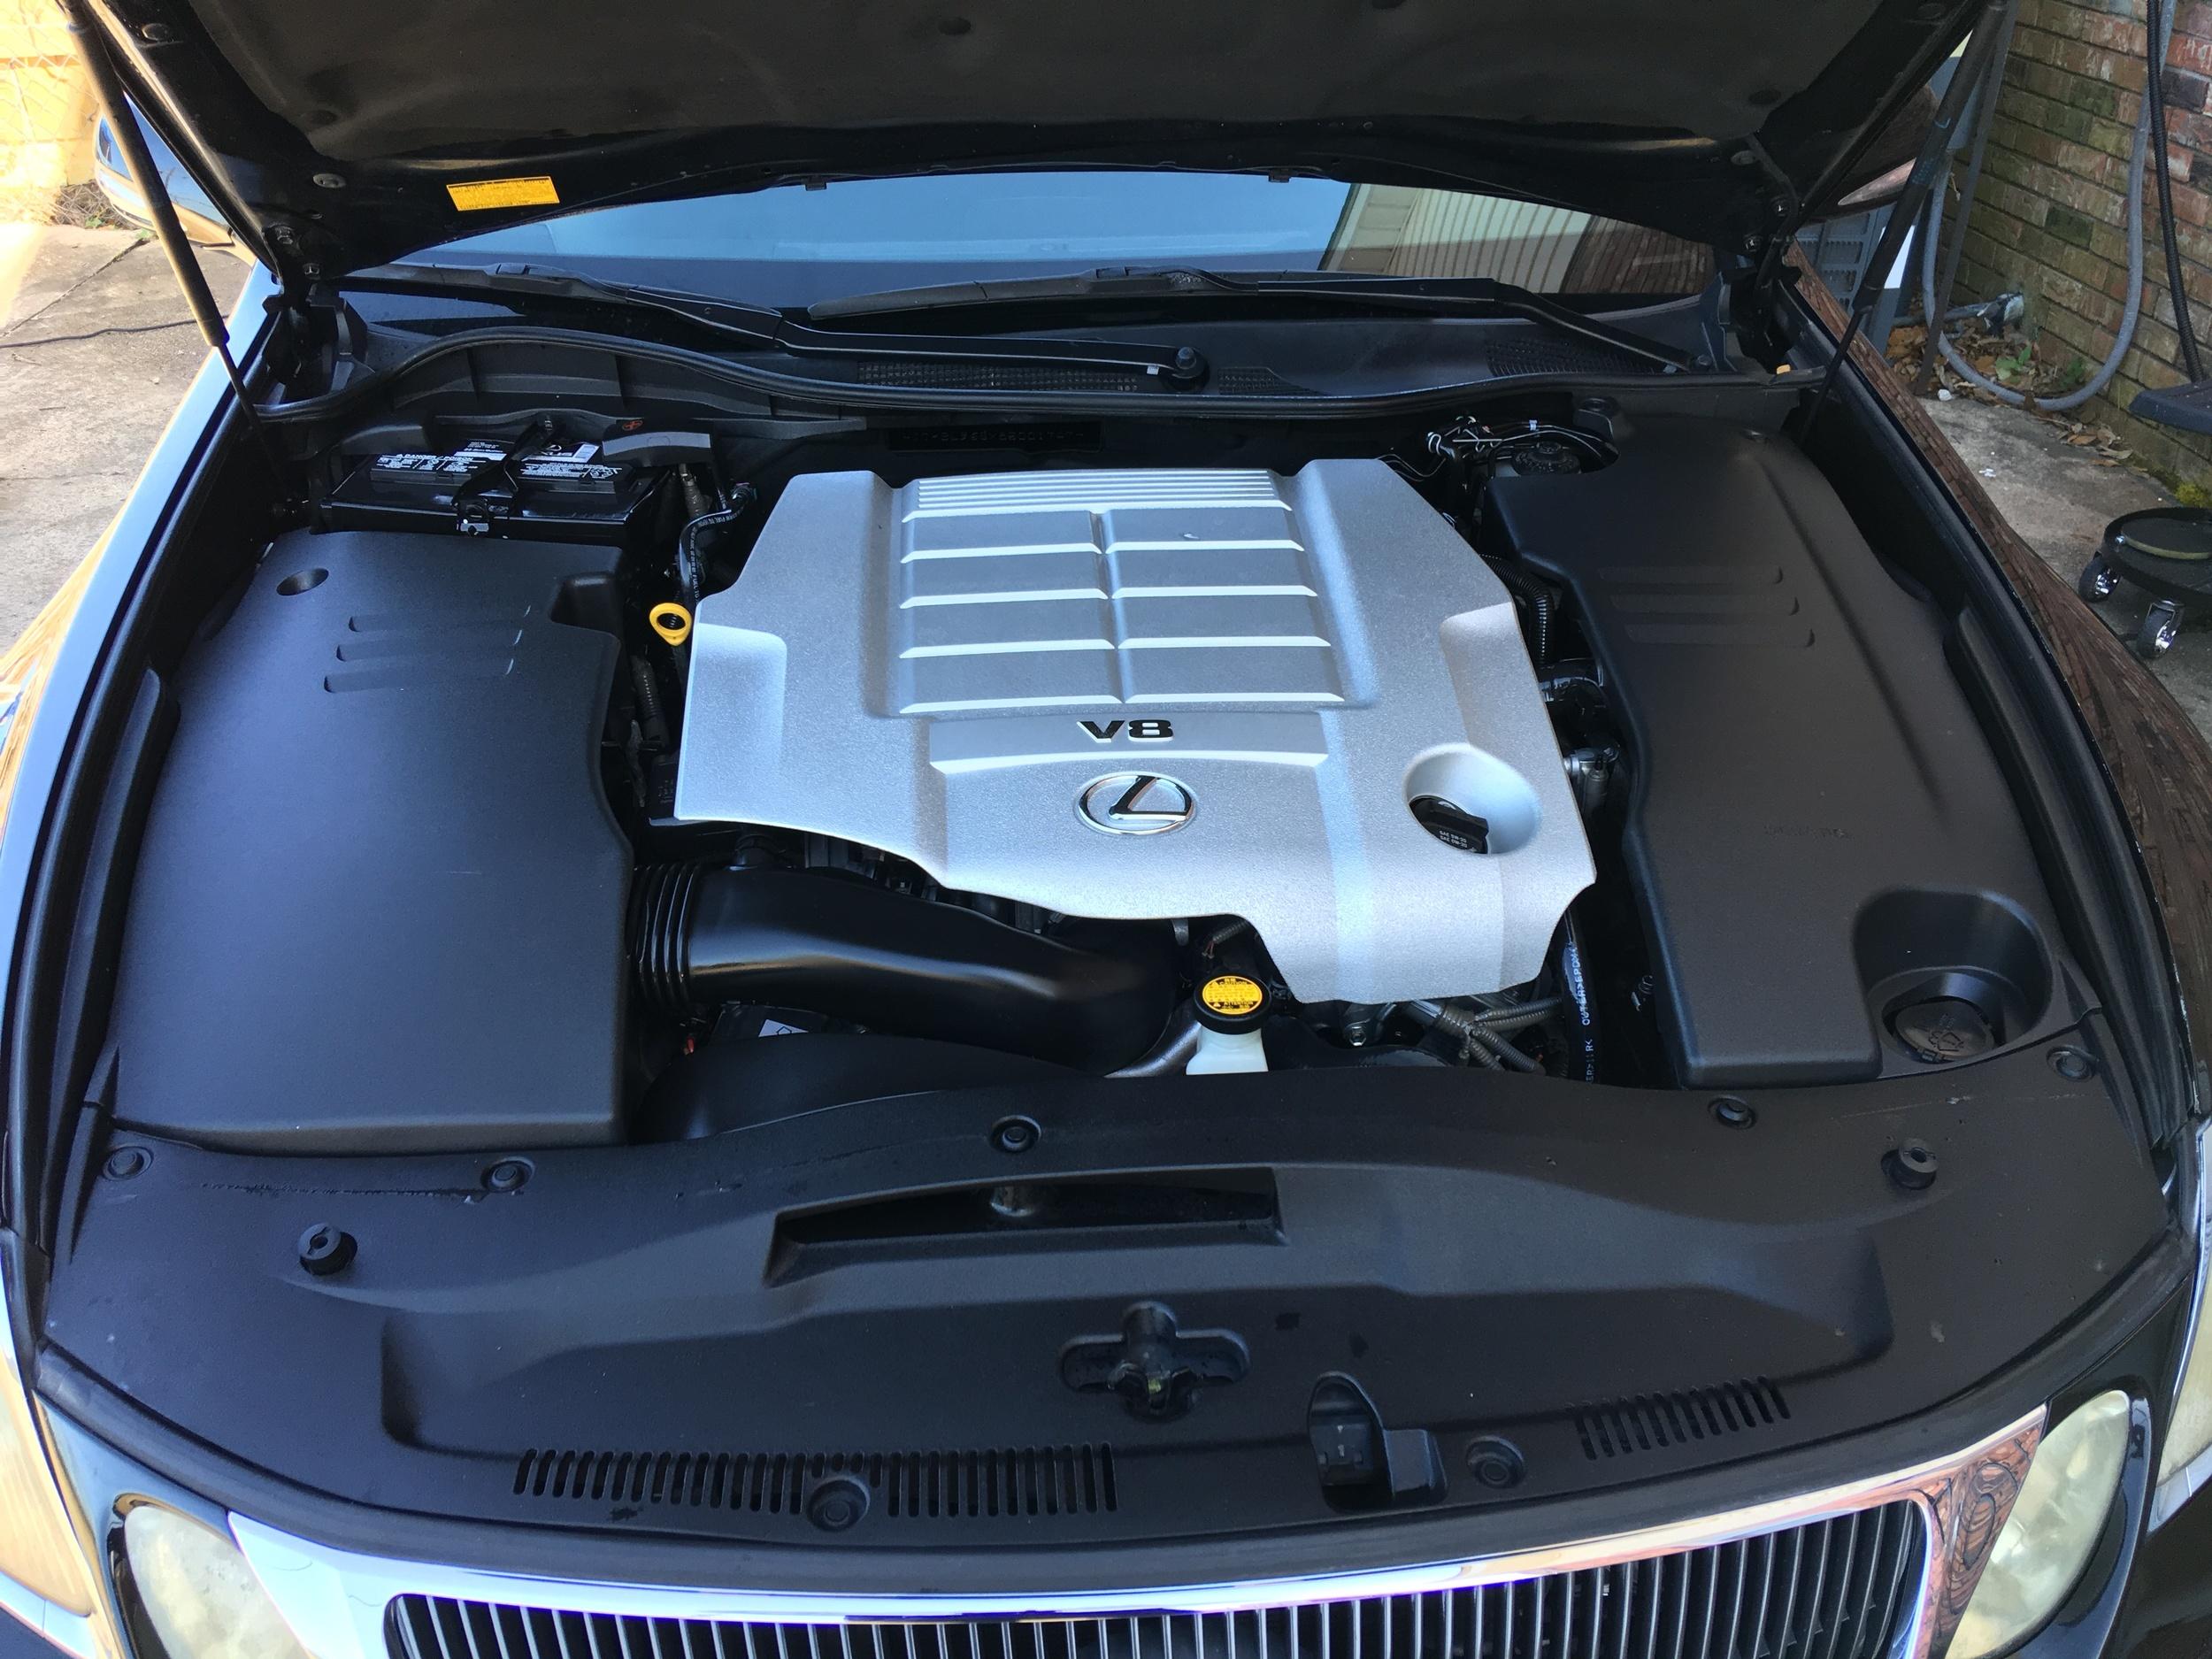 Lexus GS 450 (Clean Slate)